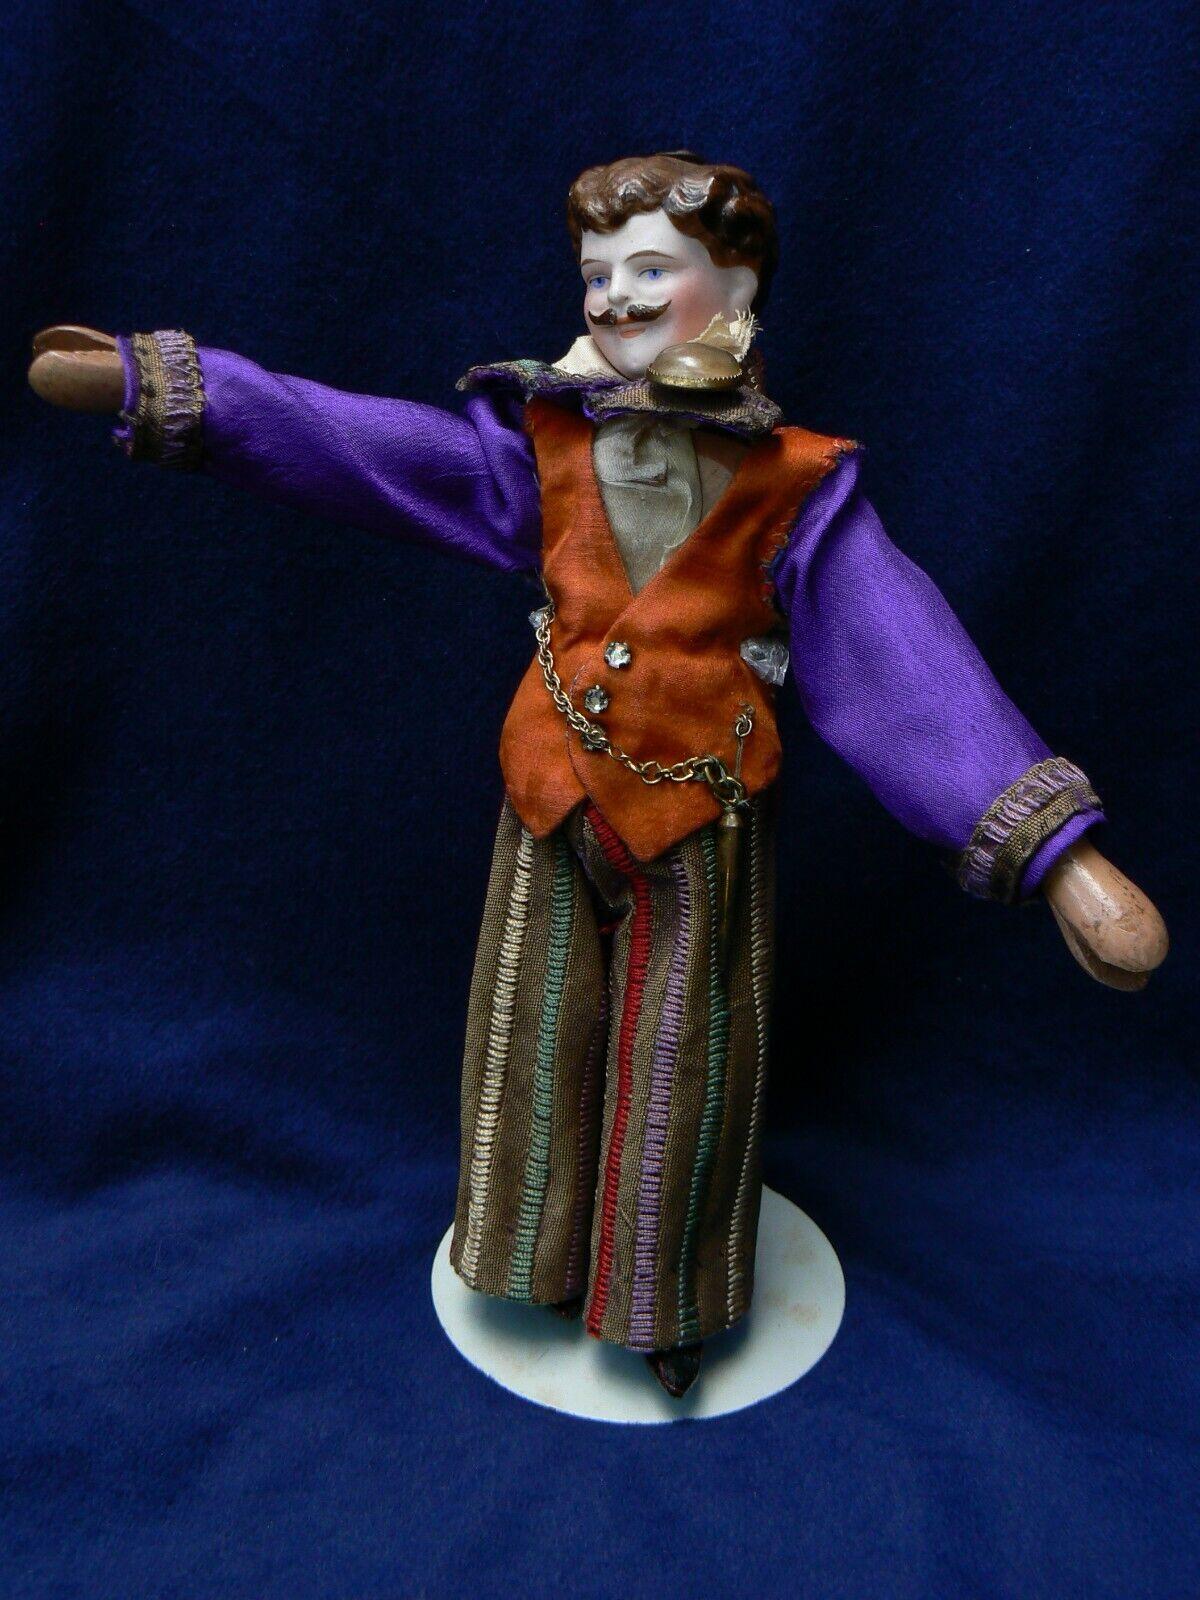 Antiguo Simon Halbig hombre Muñeca Schoenhut Circo Ringmaster cuerpo de madera 7.5